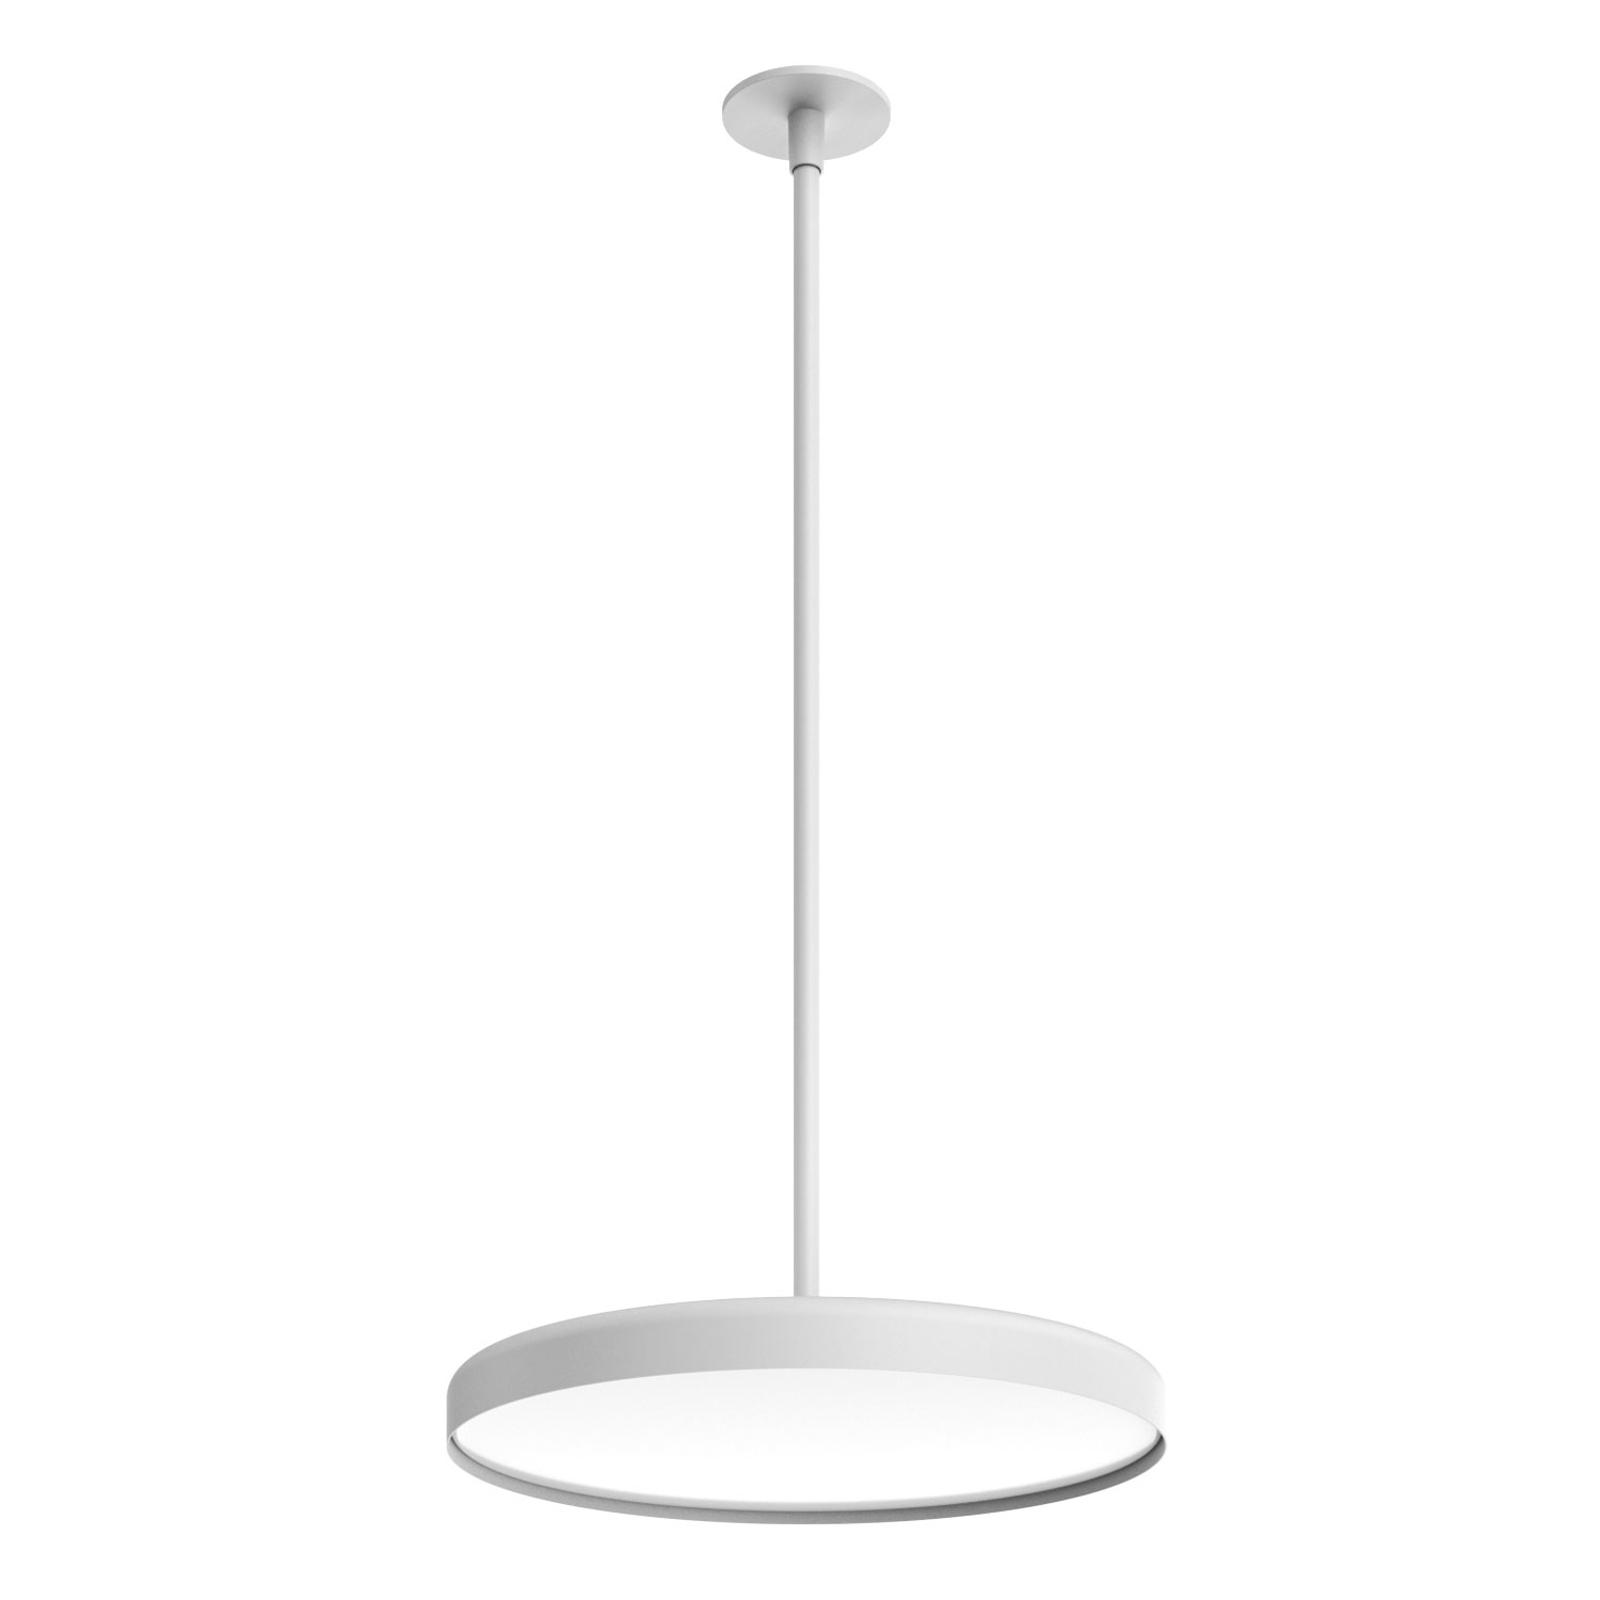 FLOS Infra-Structure C1 LED plafondlamp wit